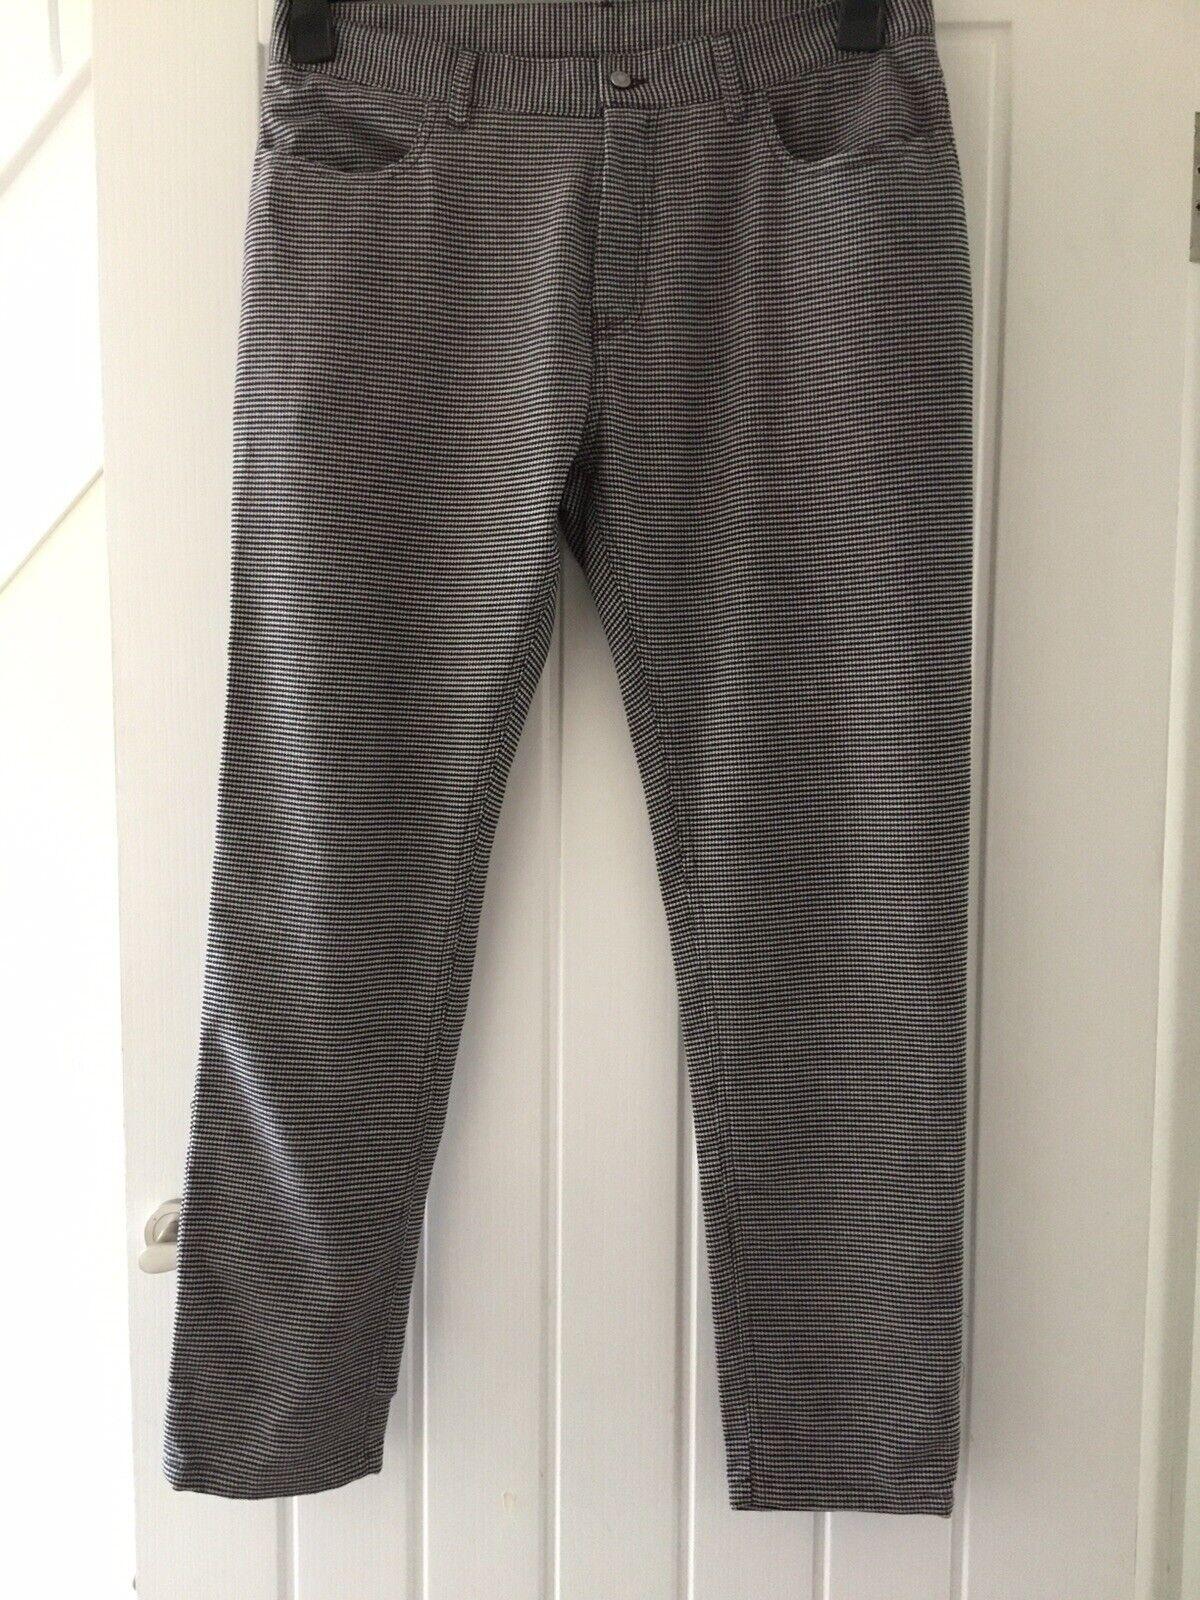 Zara Mens Trousers Size 34, New